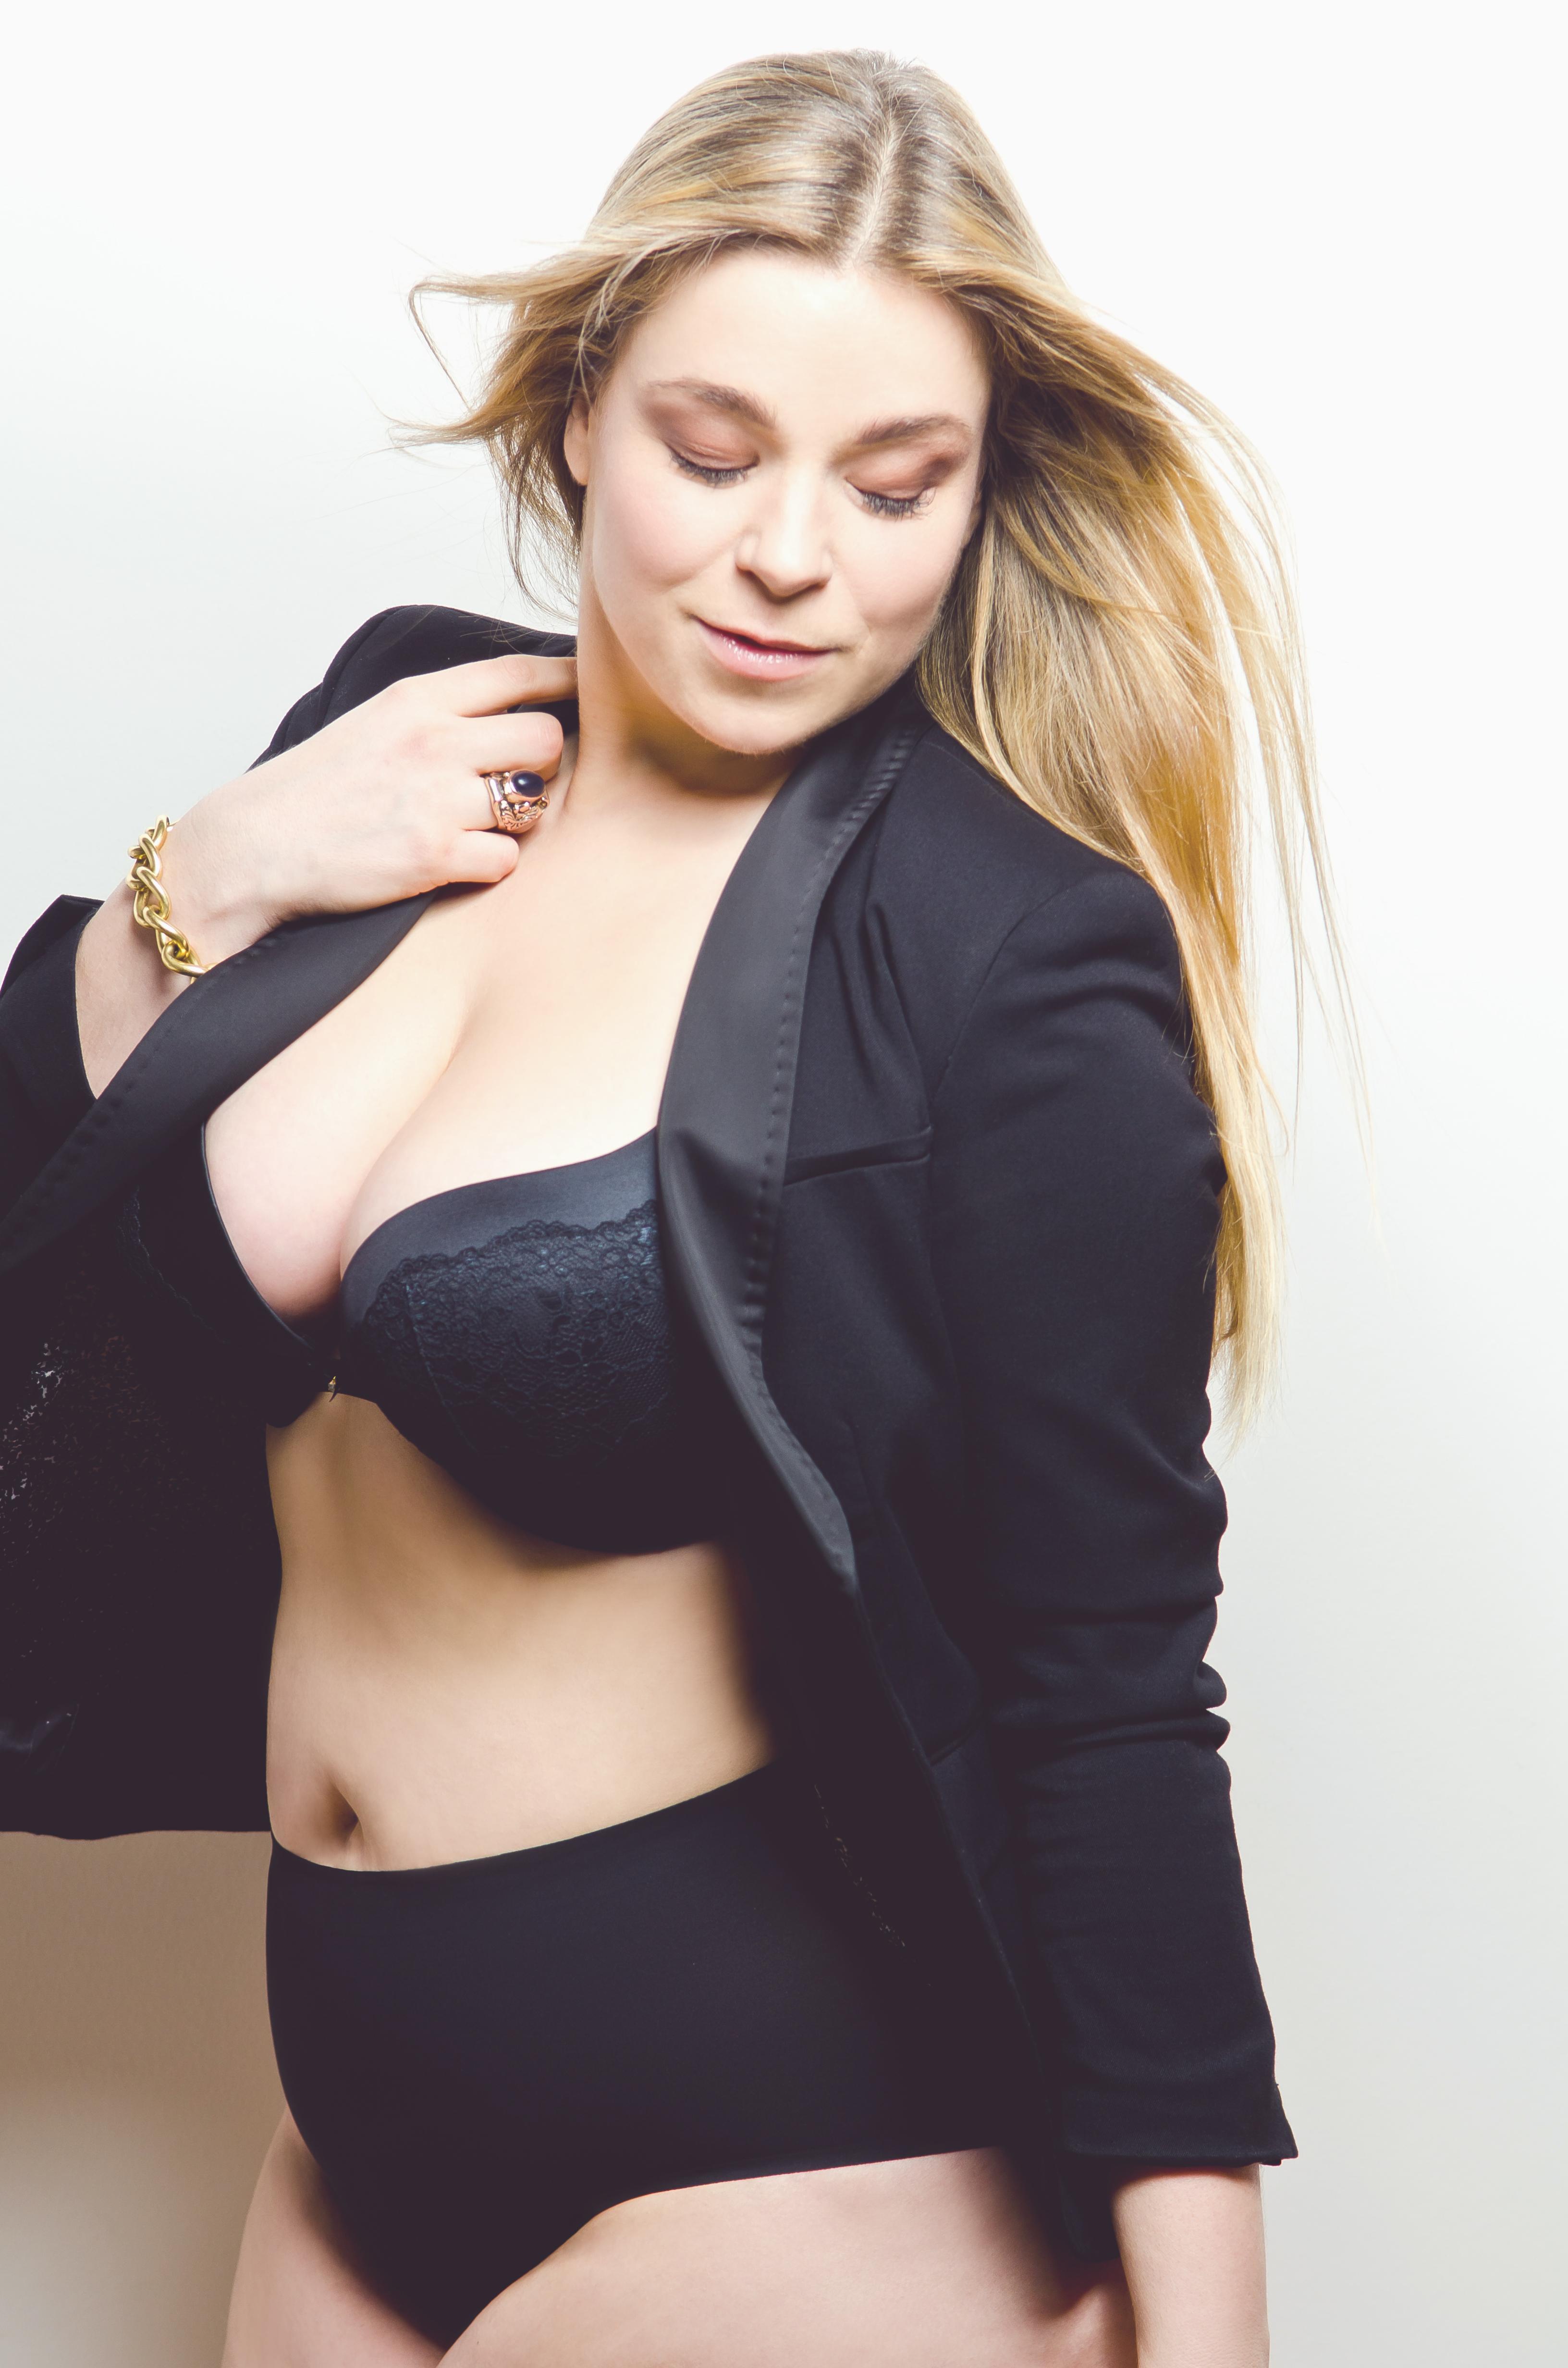 Caterina-pogorzelski-Megabambi-kick